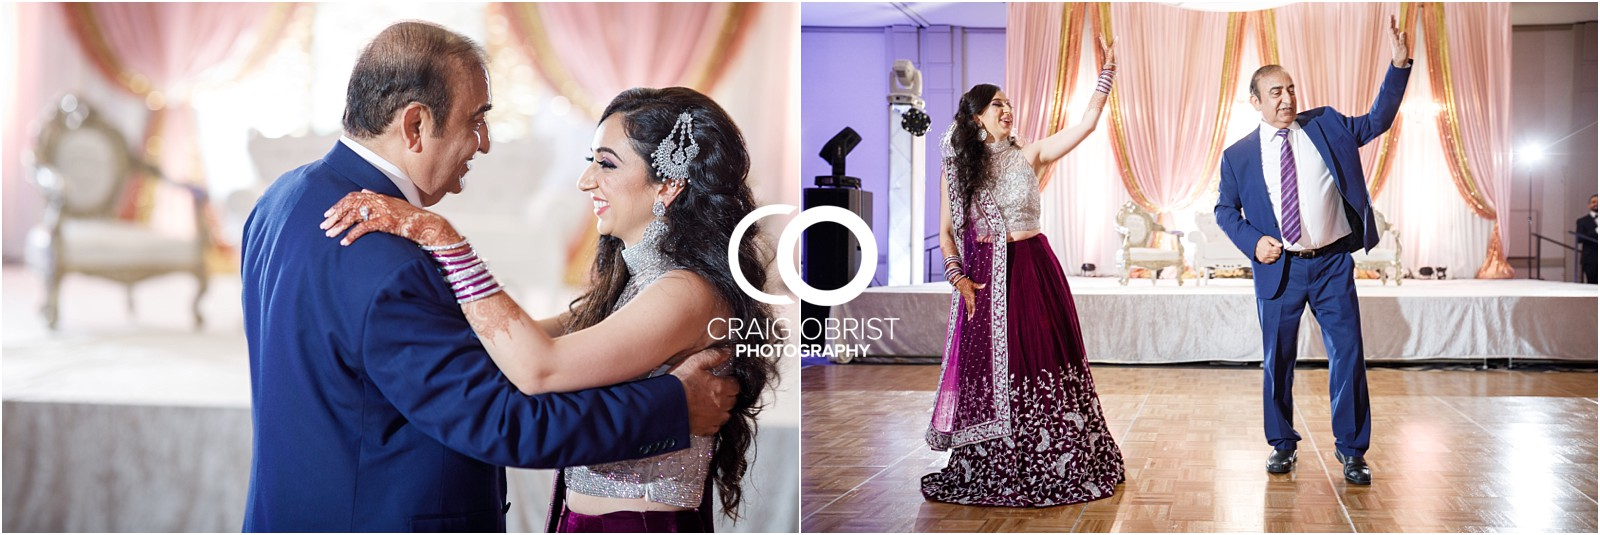 Atlanta Hilton Northeast South Asian Wedding Portraits_0052.jpg